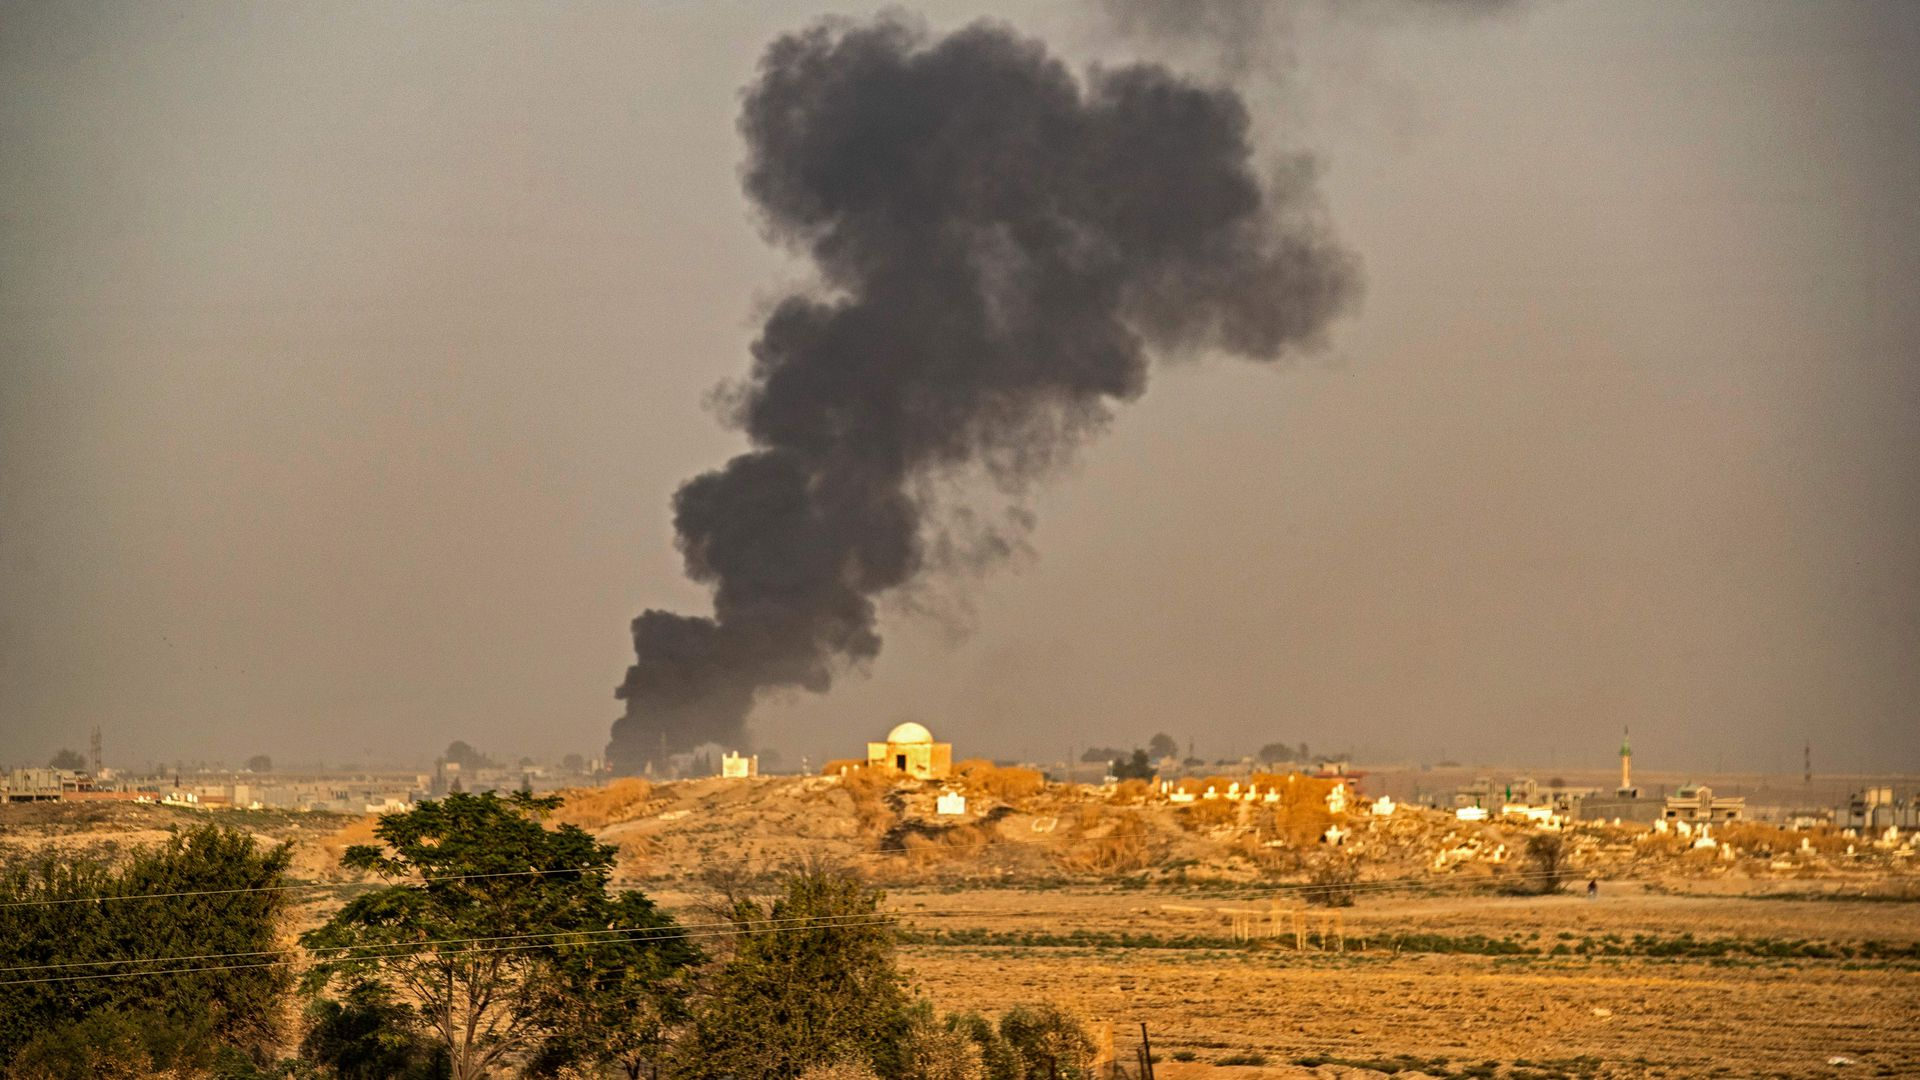 Smoke following Turkish bombardment on Syrian town of Ras al-Ain.